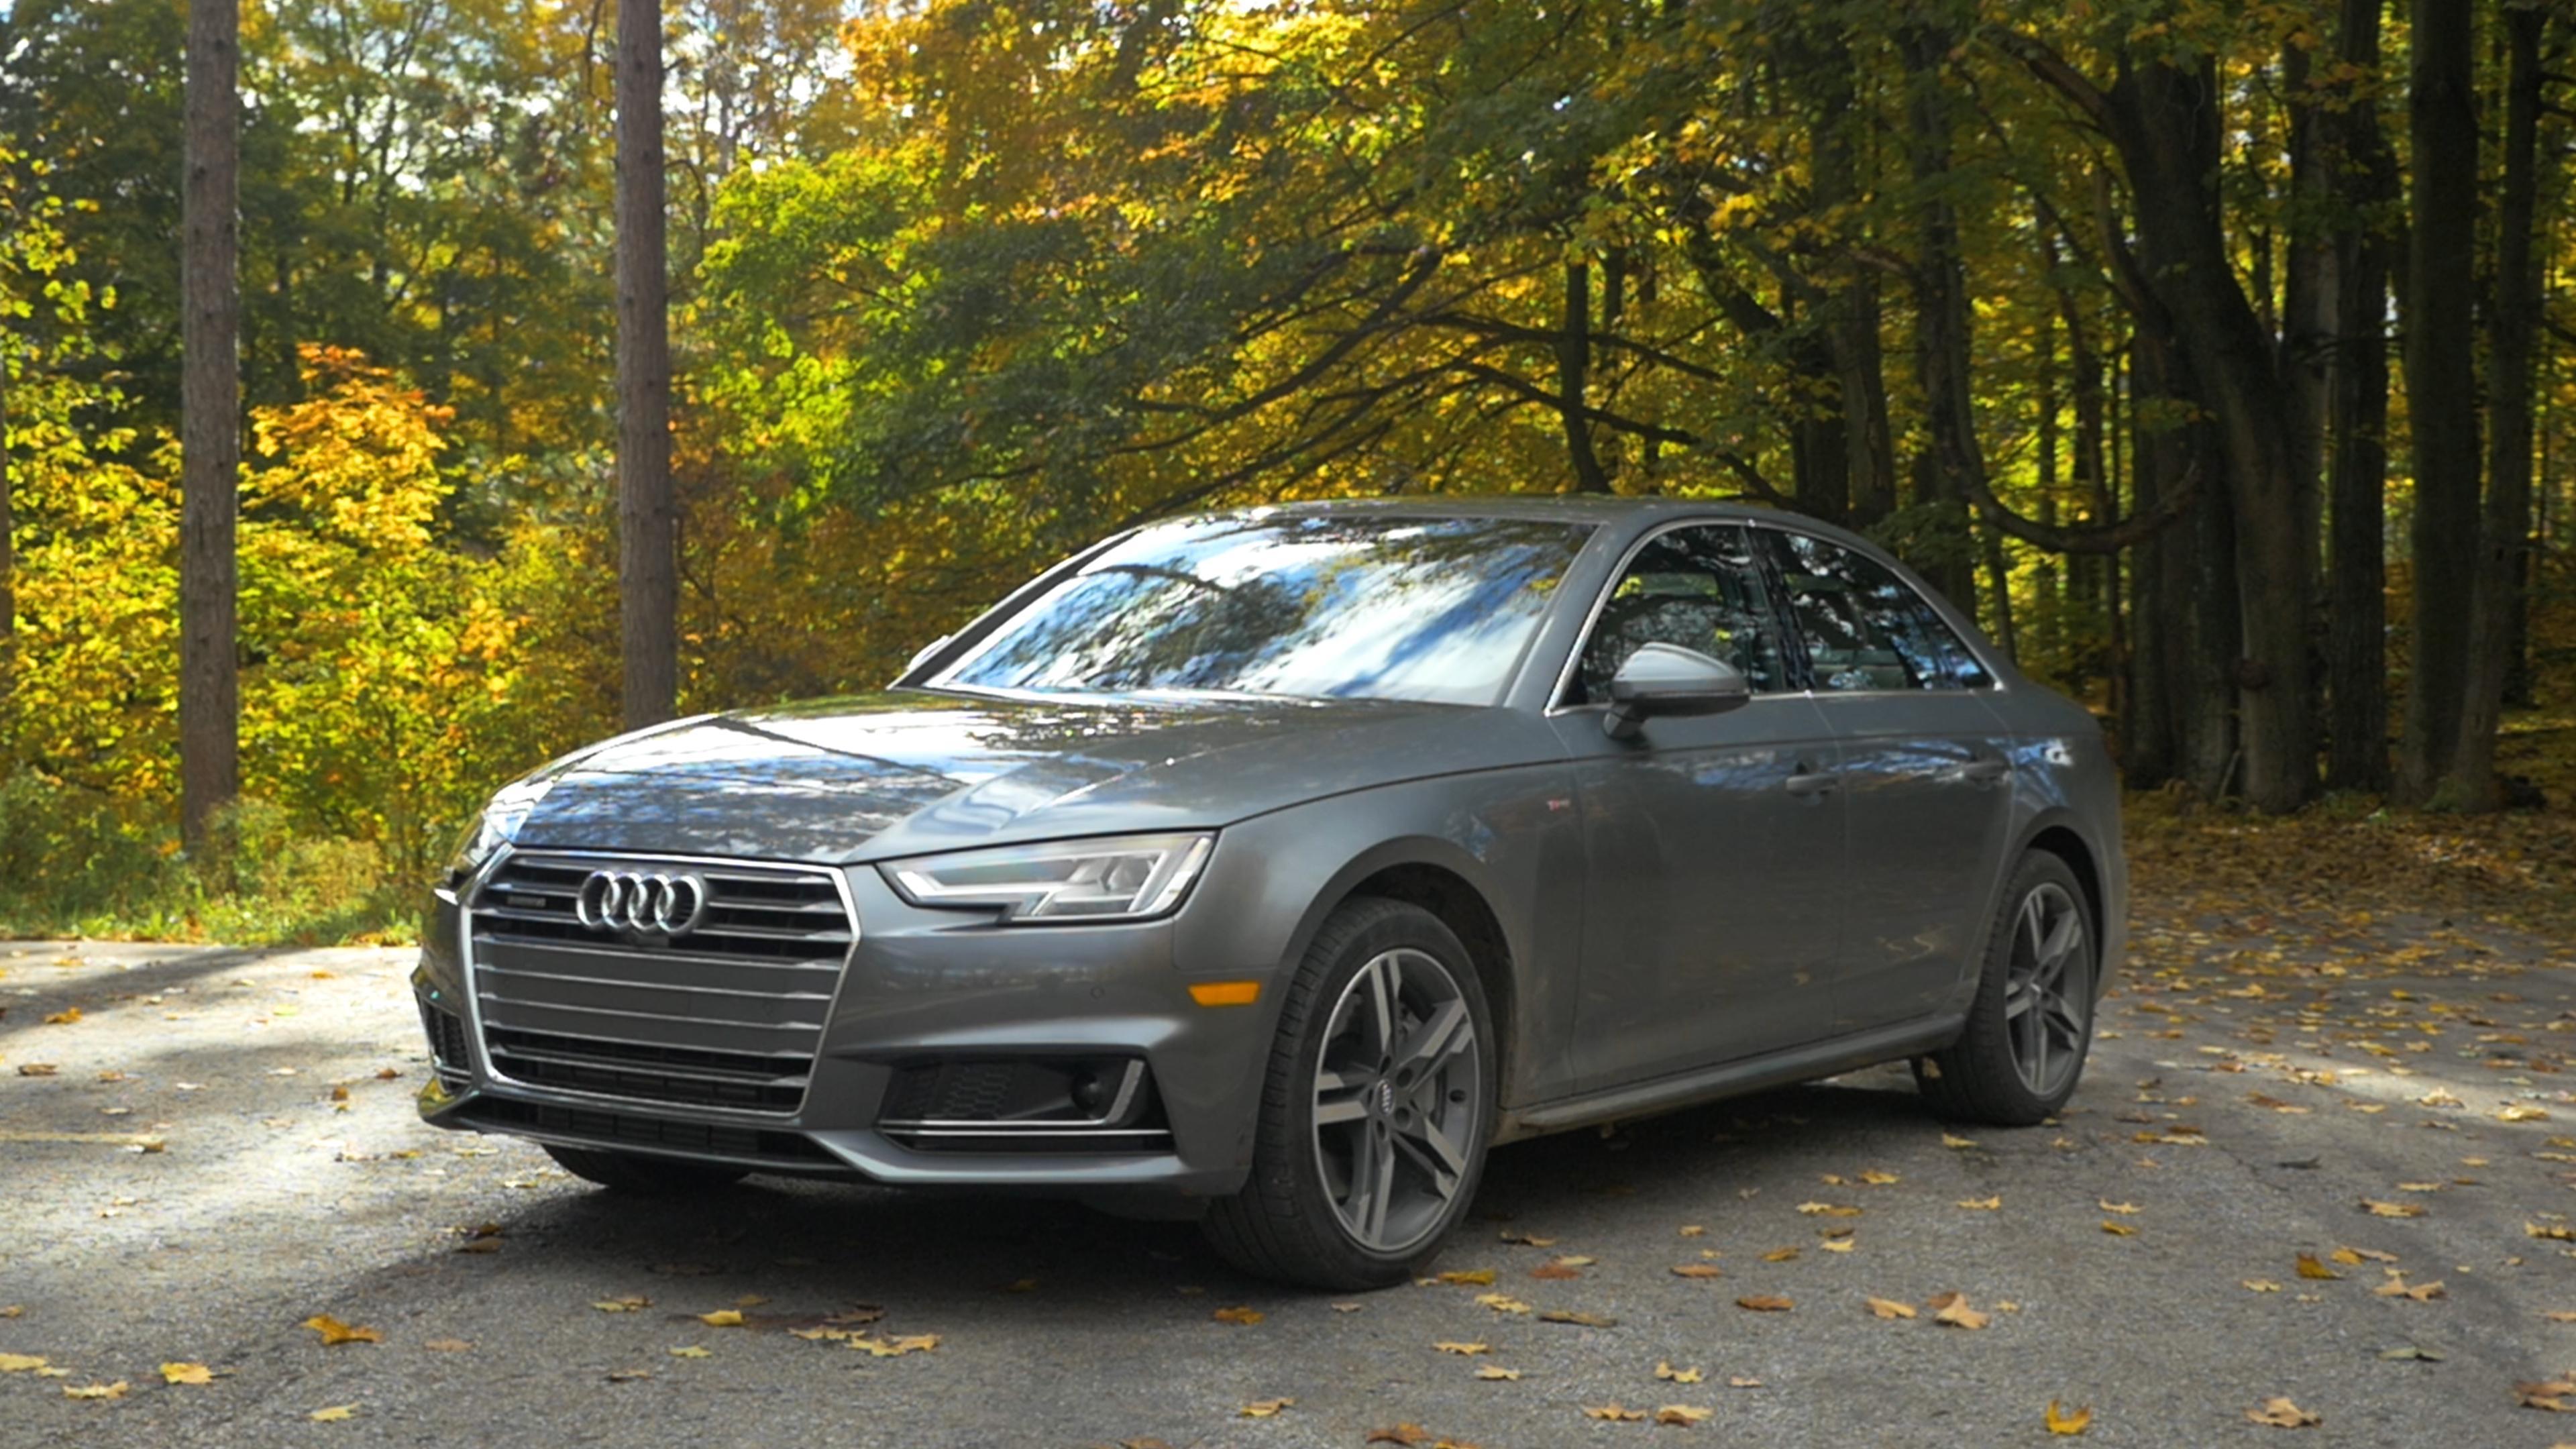 Audi Adaptive Cruise Control | Autoblog Tech